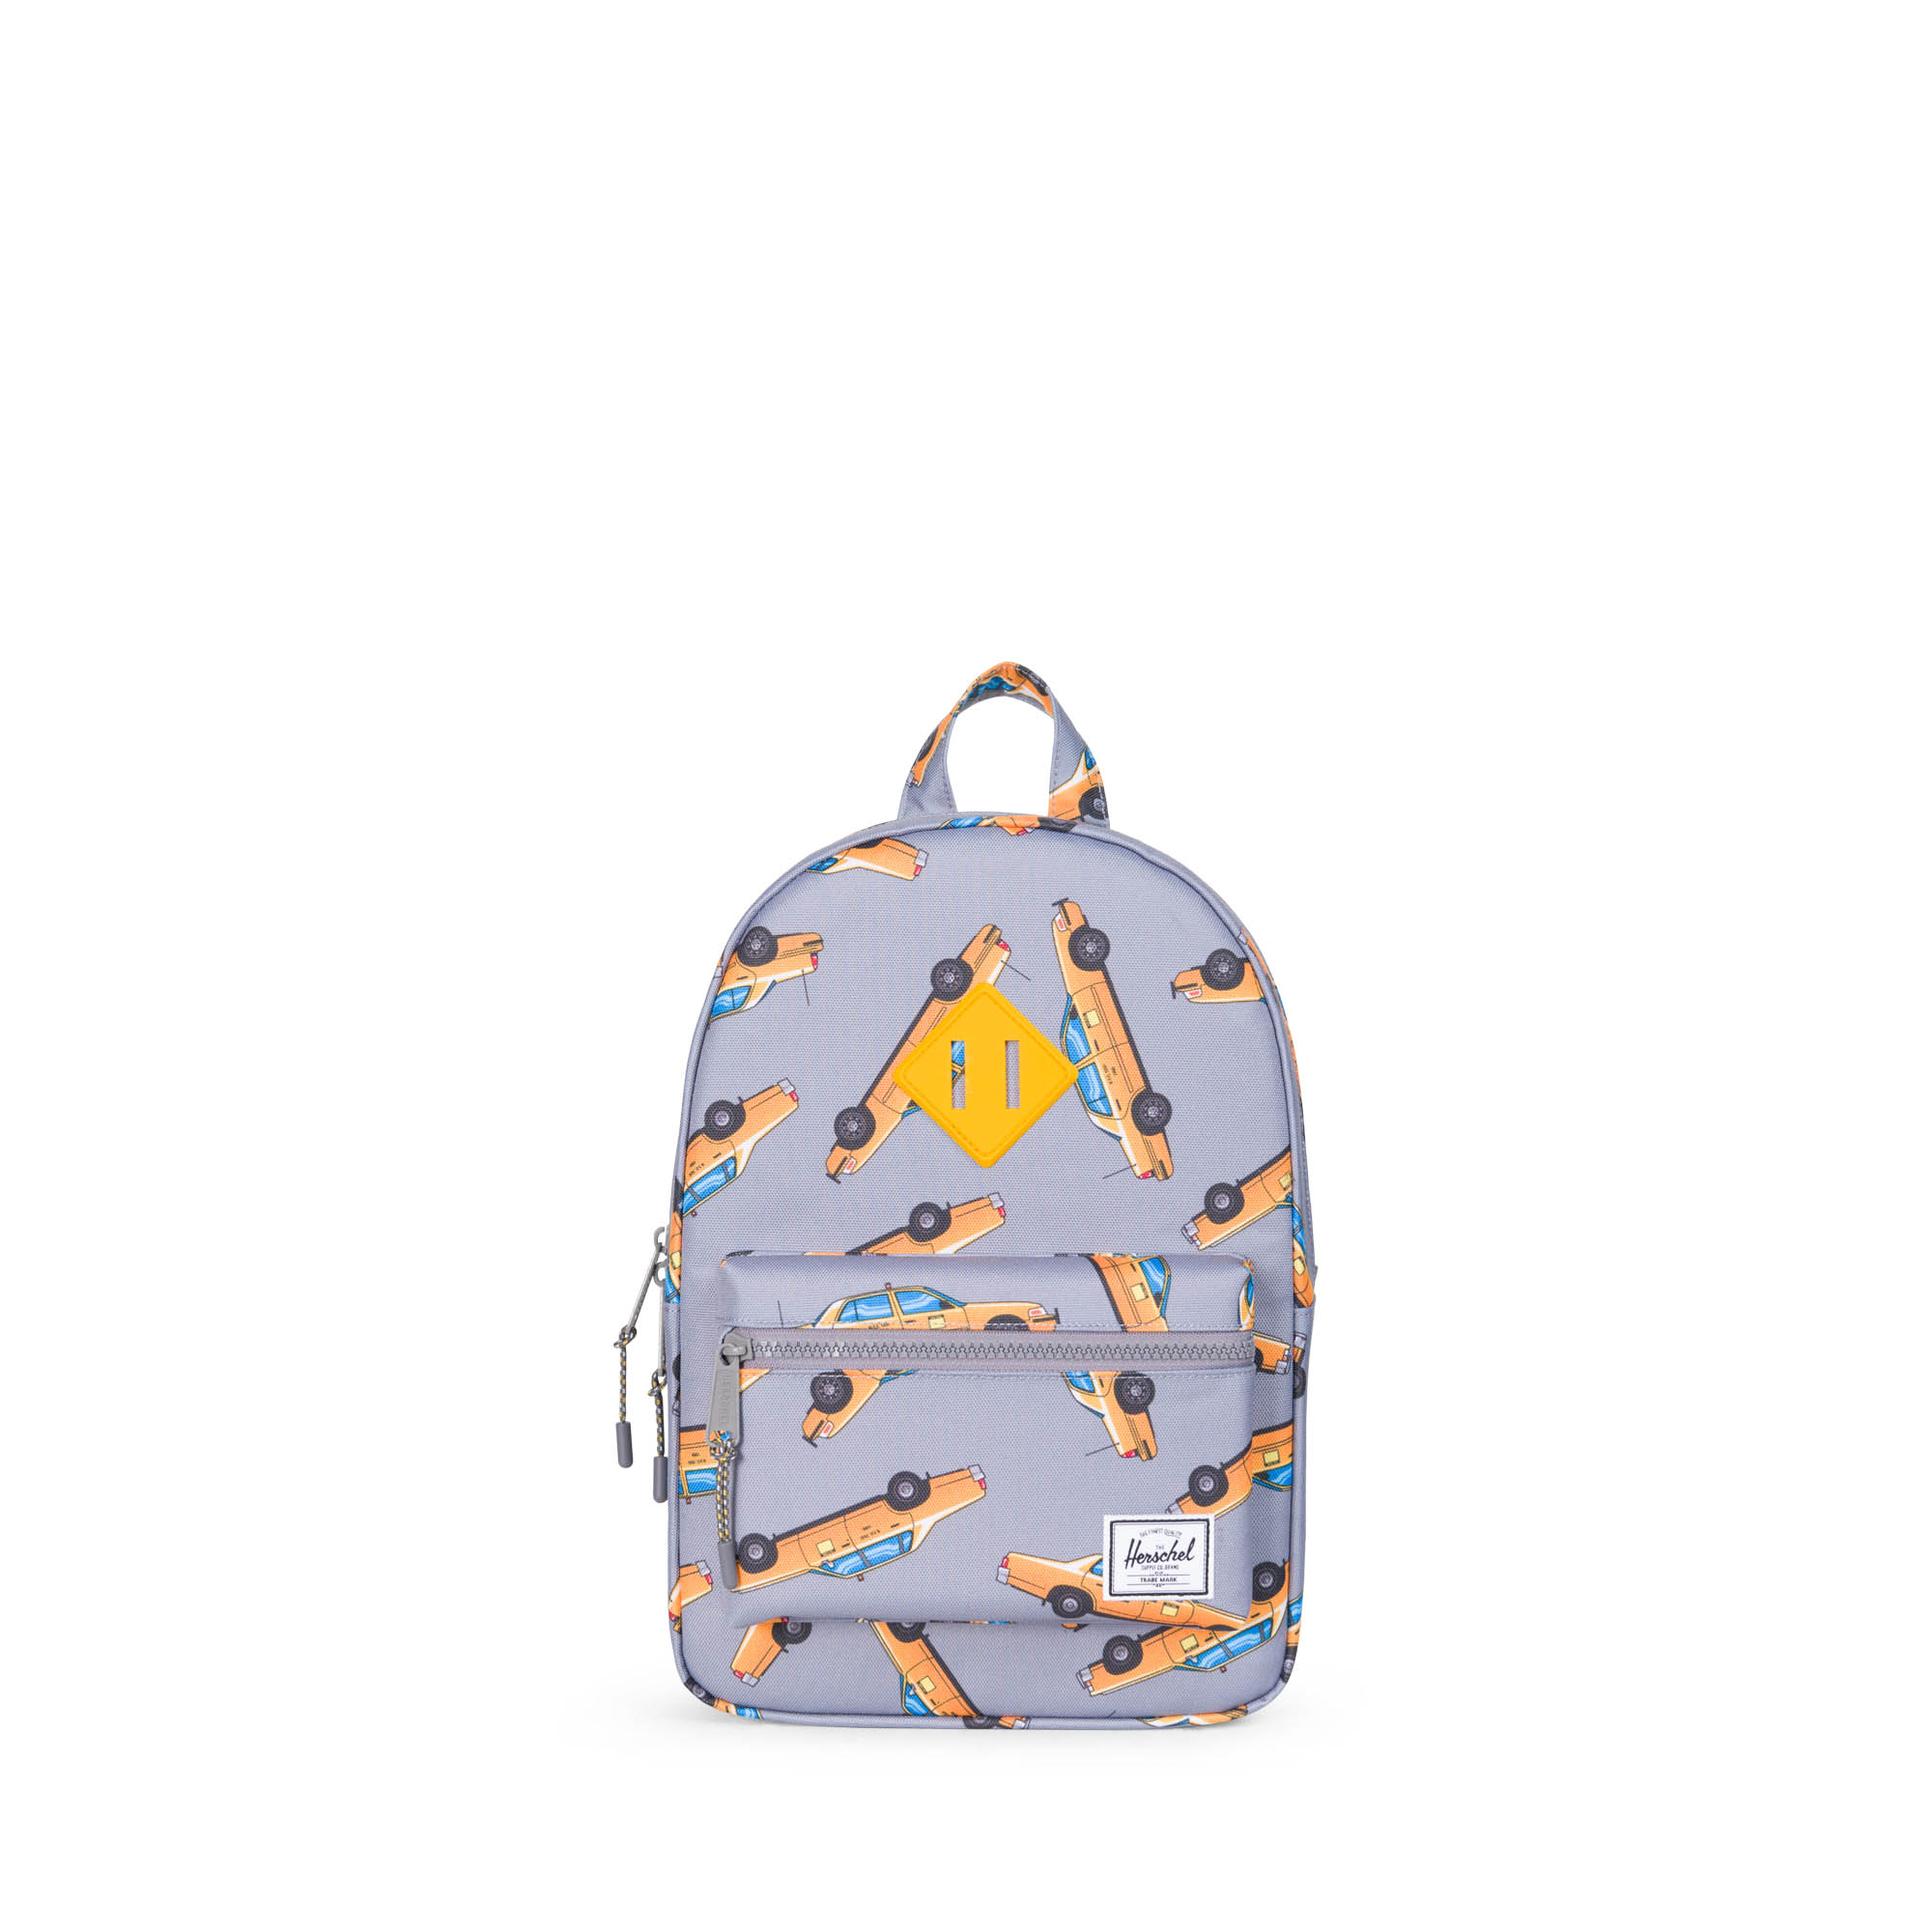 32f689d245f Heritage Backpack Kids | Herschel Supply Company